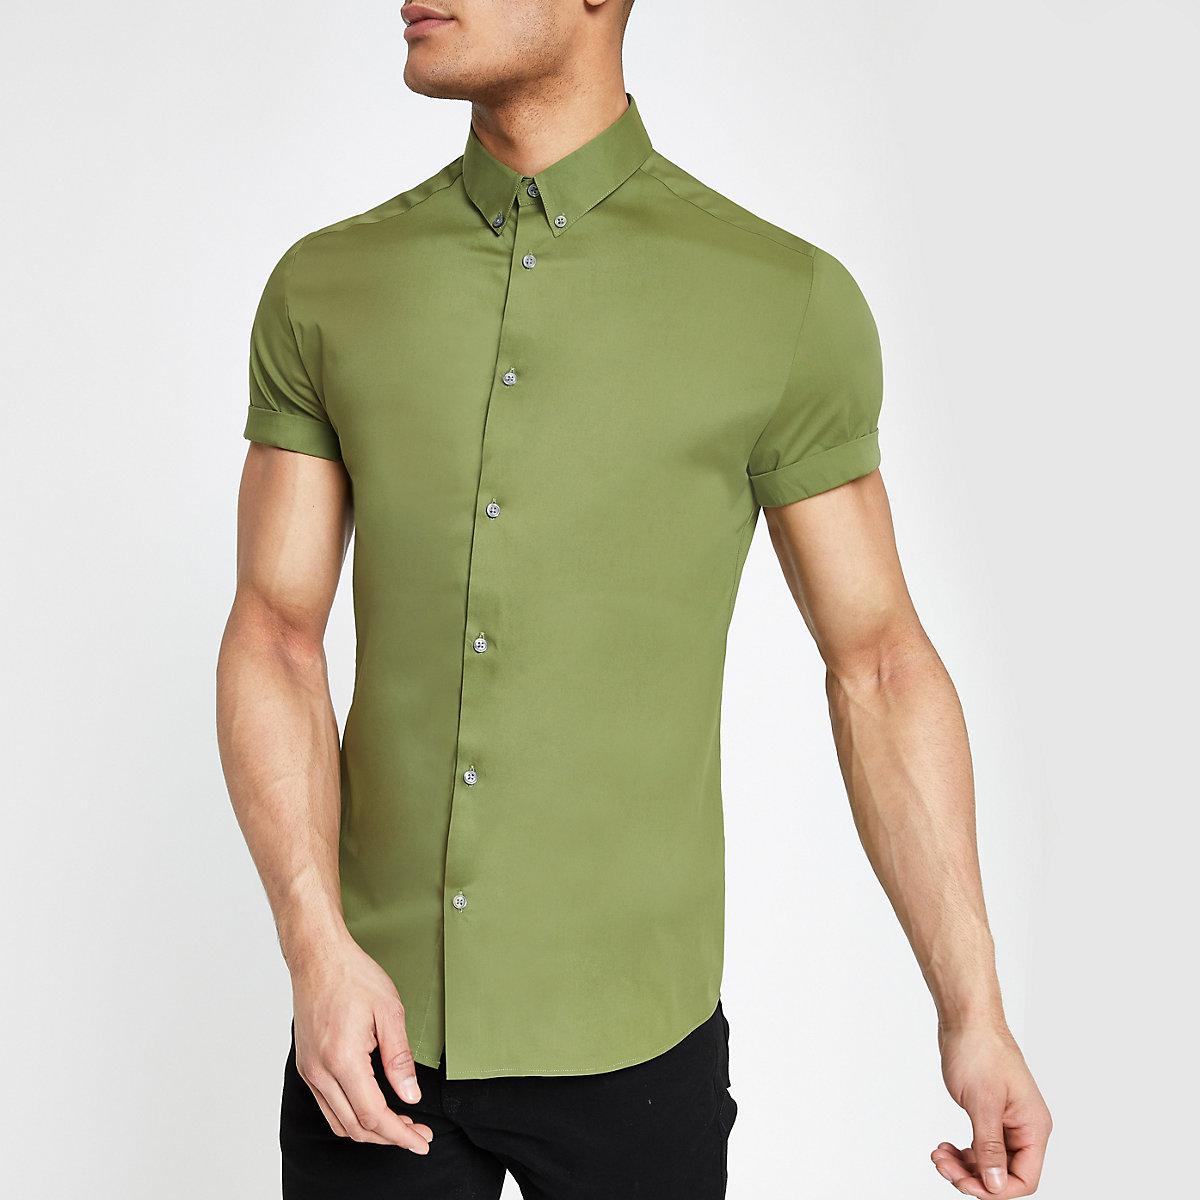 Khaki muscle fit short sleeve shirt